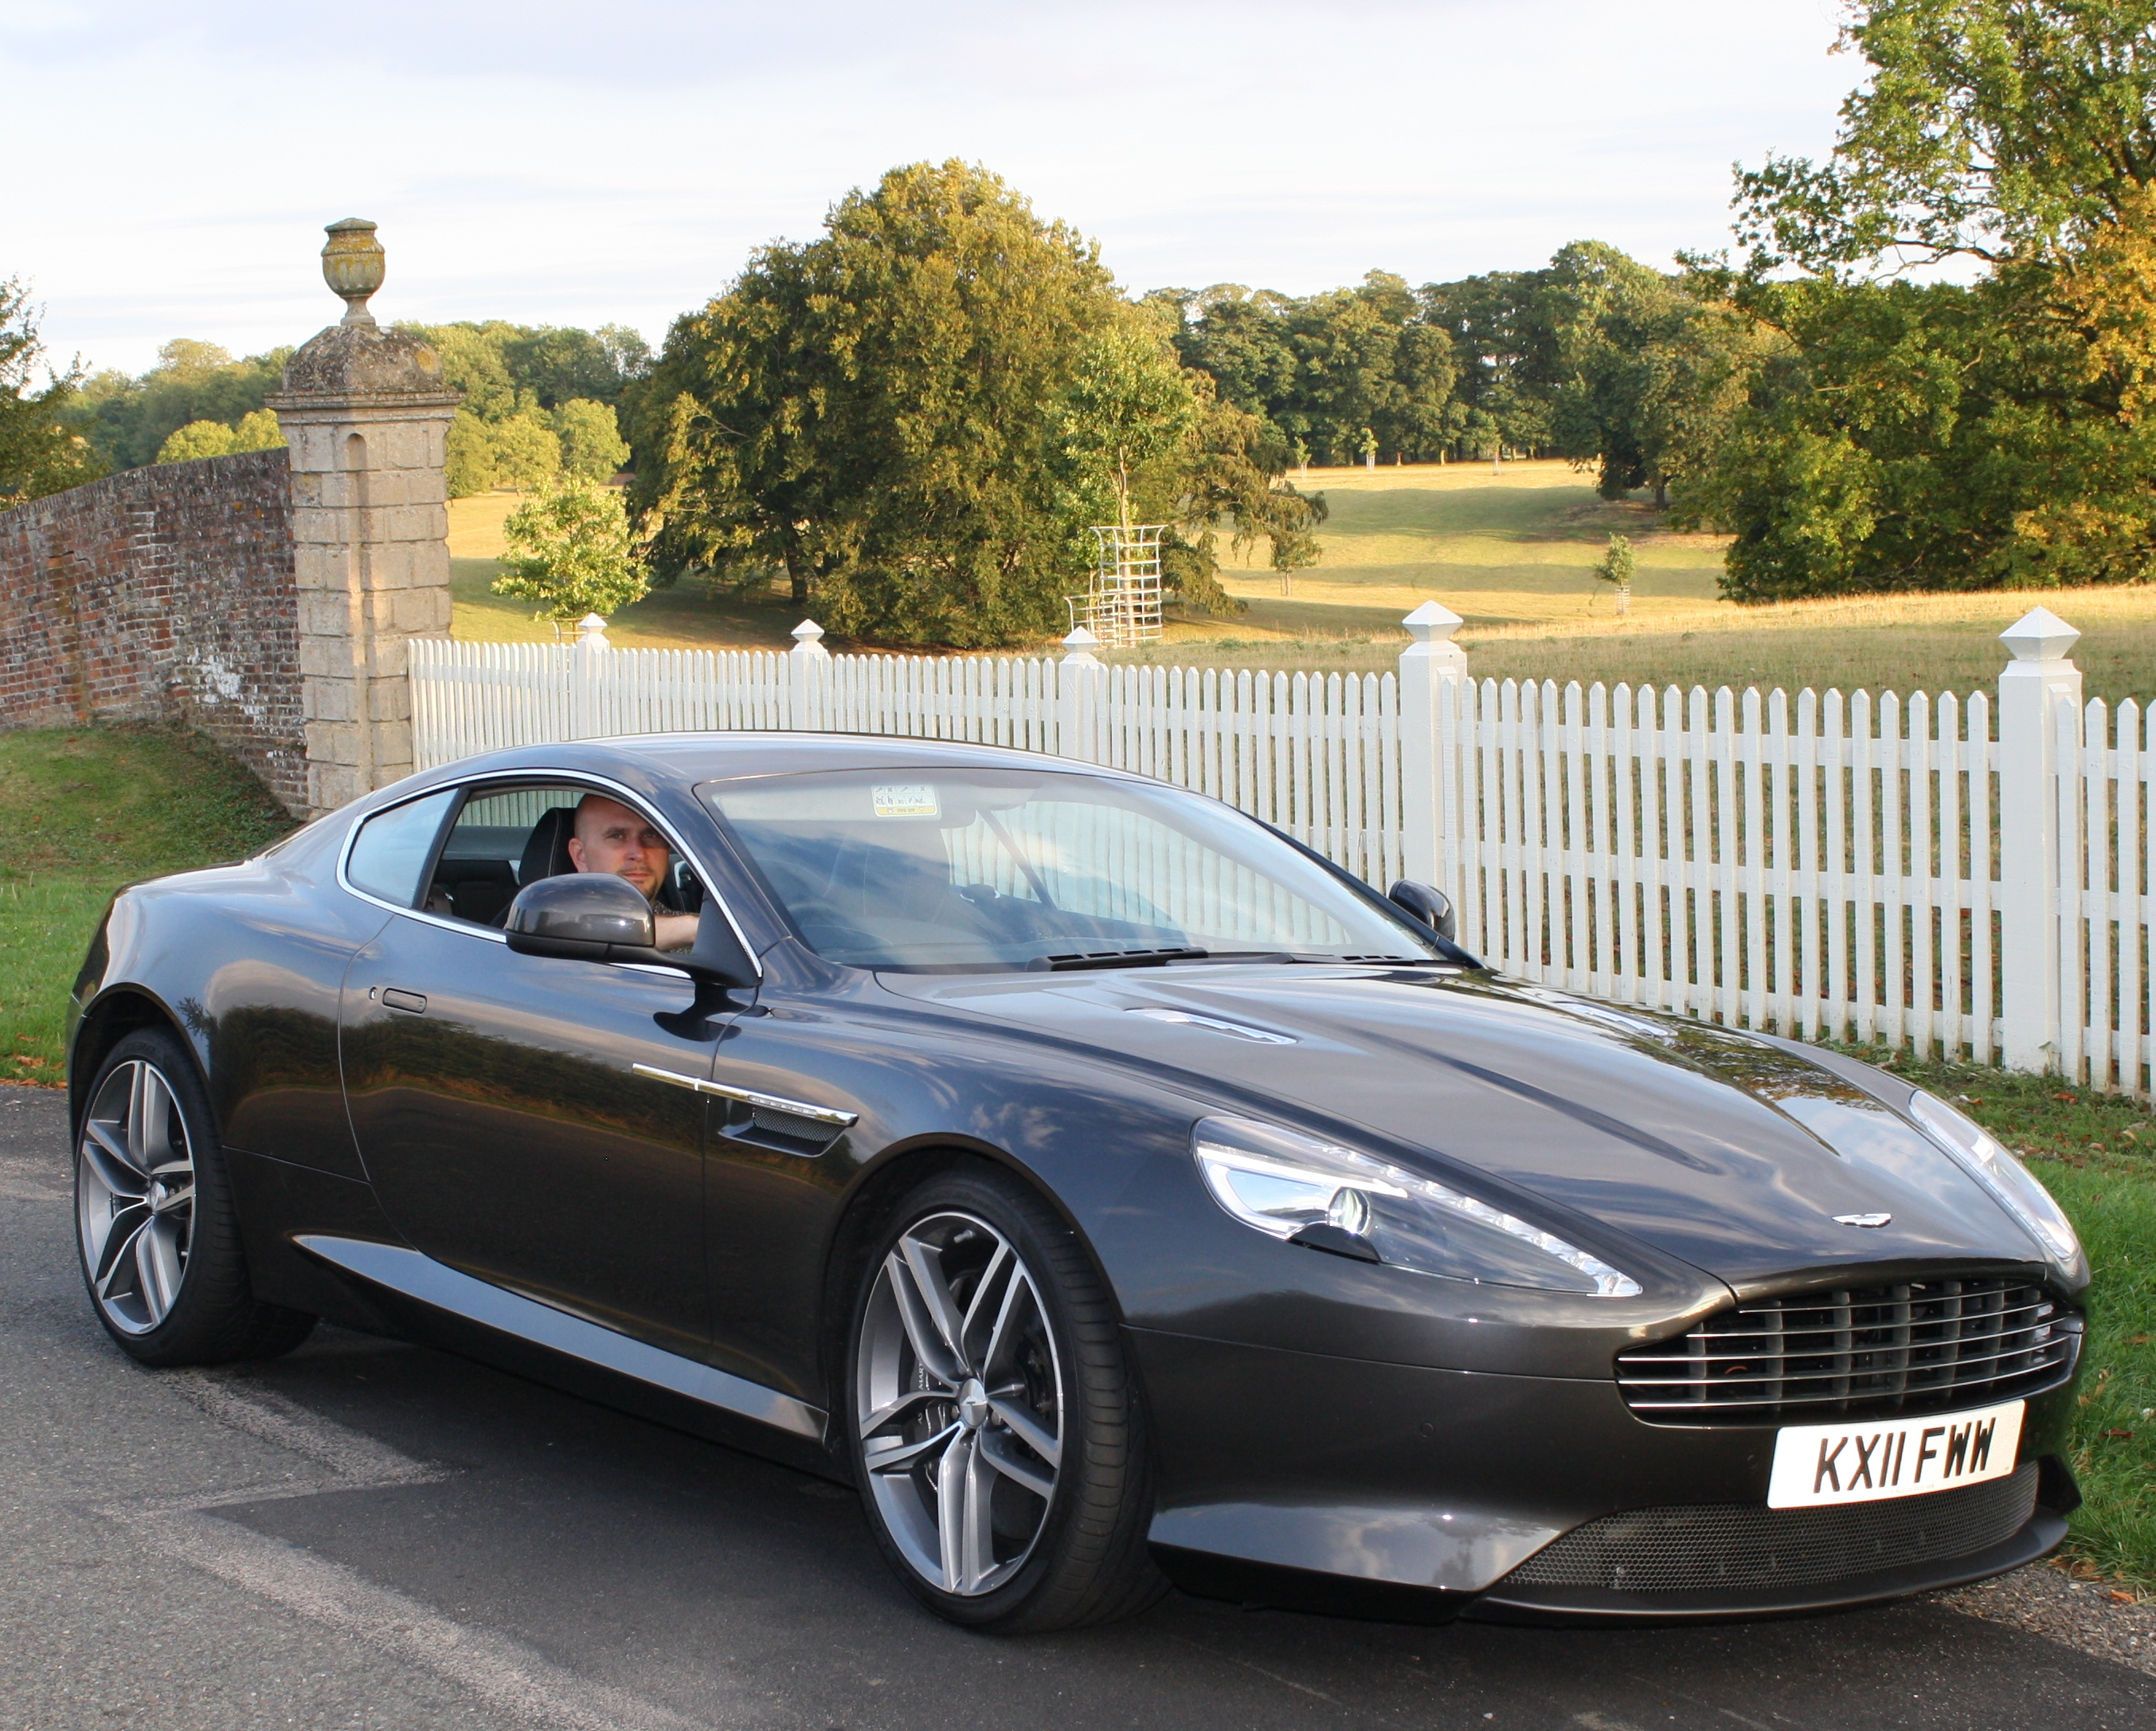 Aston Martin Virage Wallpapers Vehicles Hq Aston Martin Virage Pictures 4k Wallpapers 2019